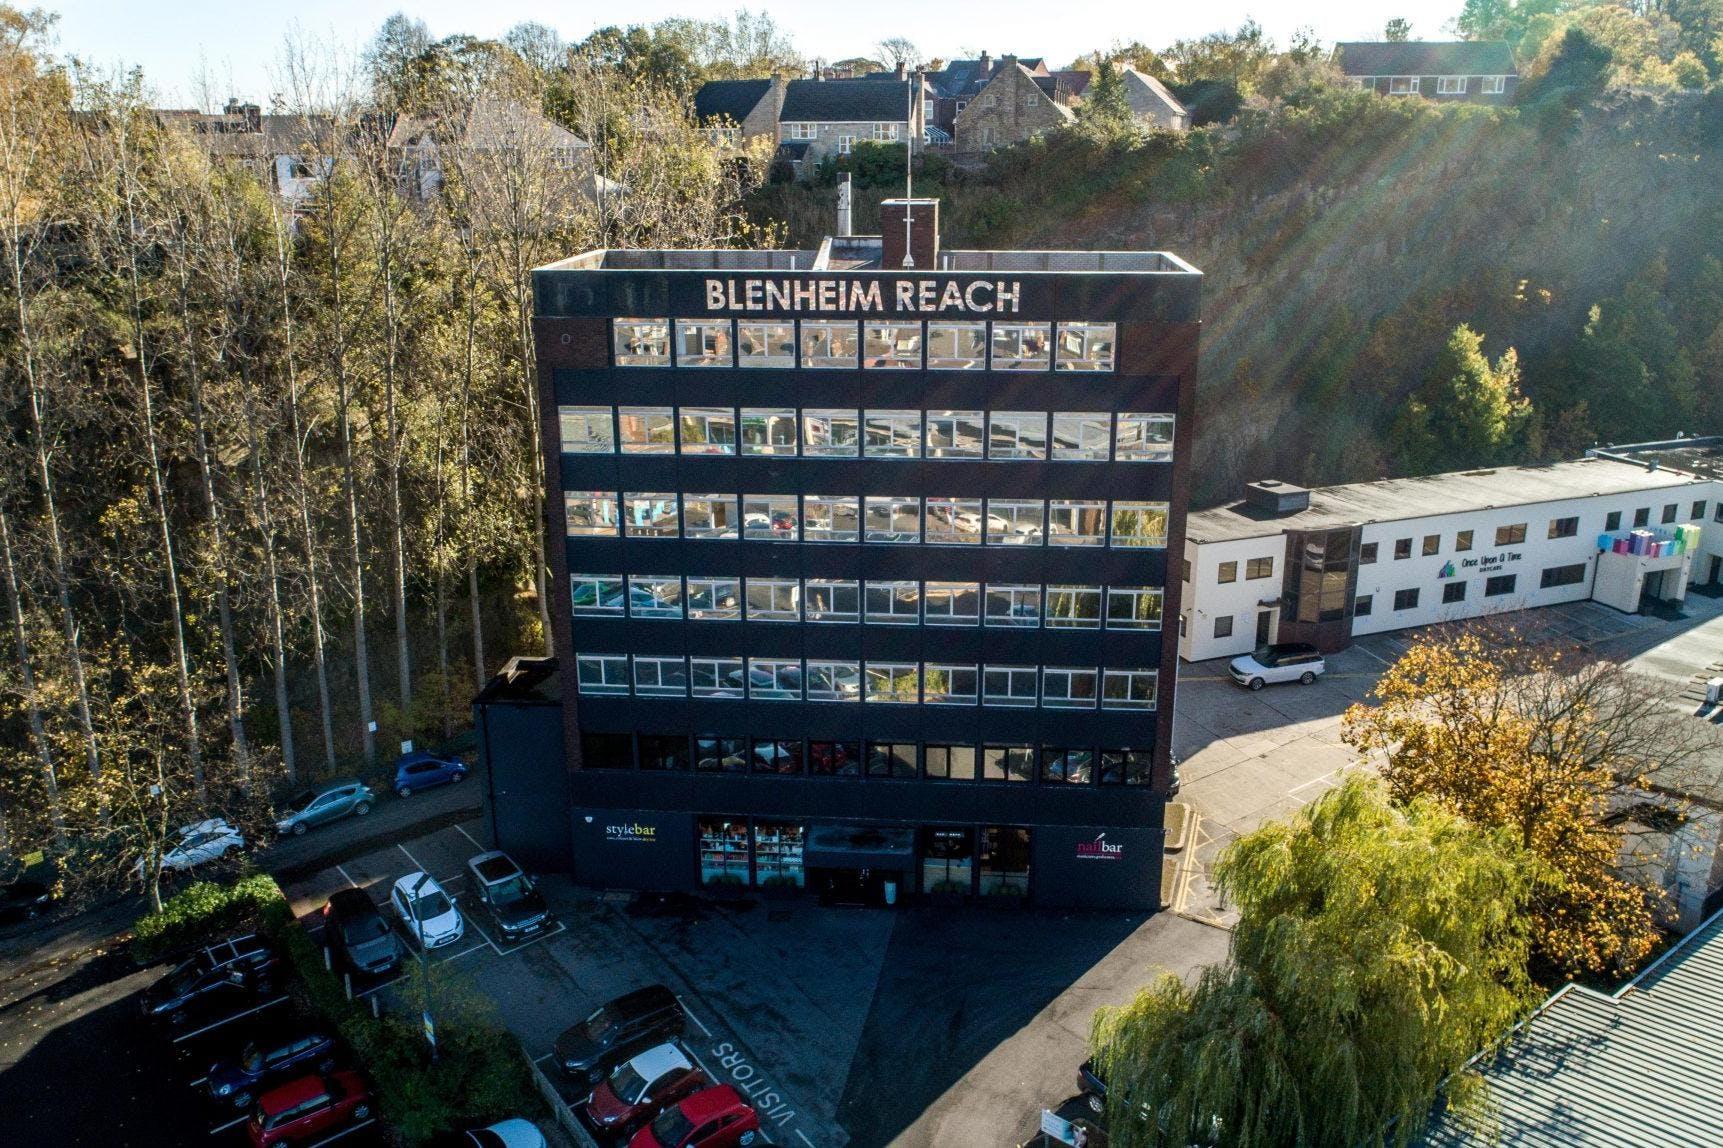 Blenheim Reach, 861 Ecclesall Road, Sheffield, Offices To Let - DJI_0005.jpg